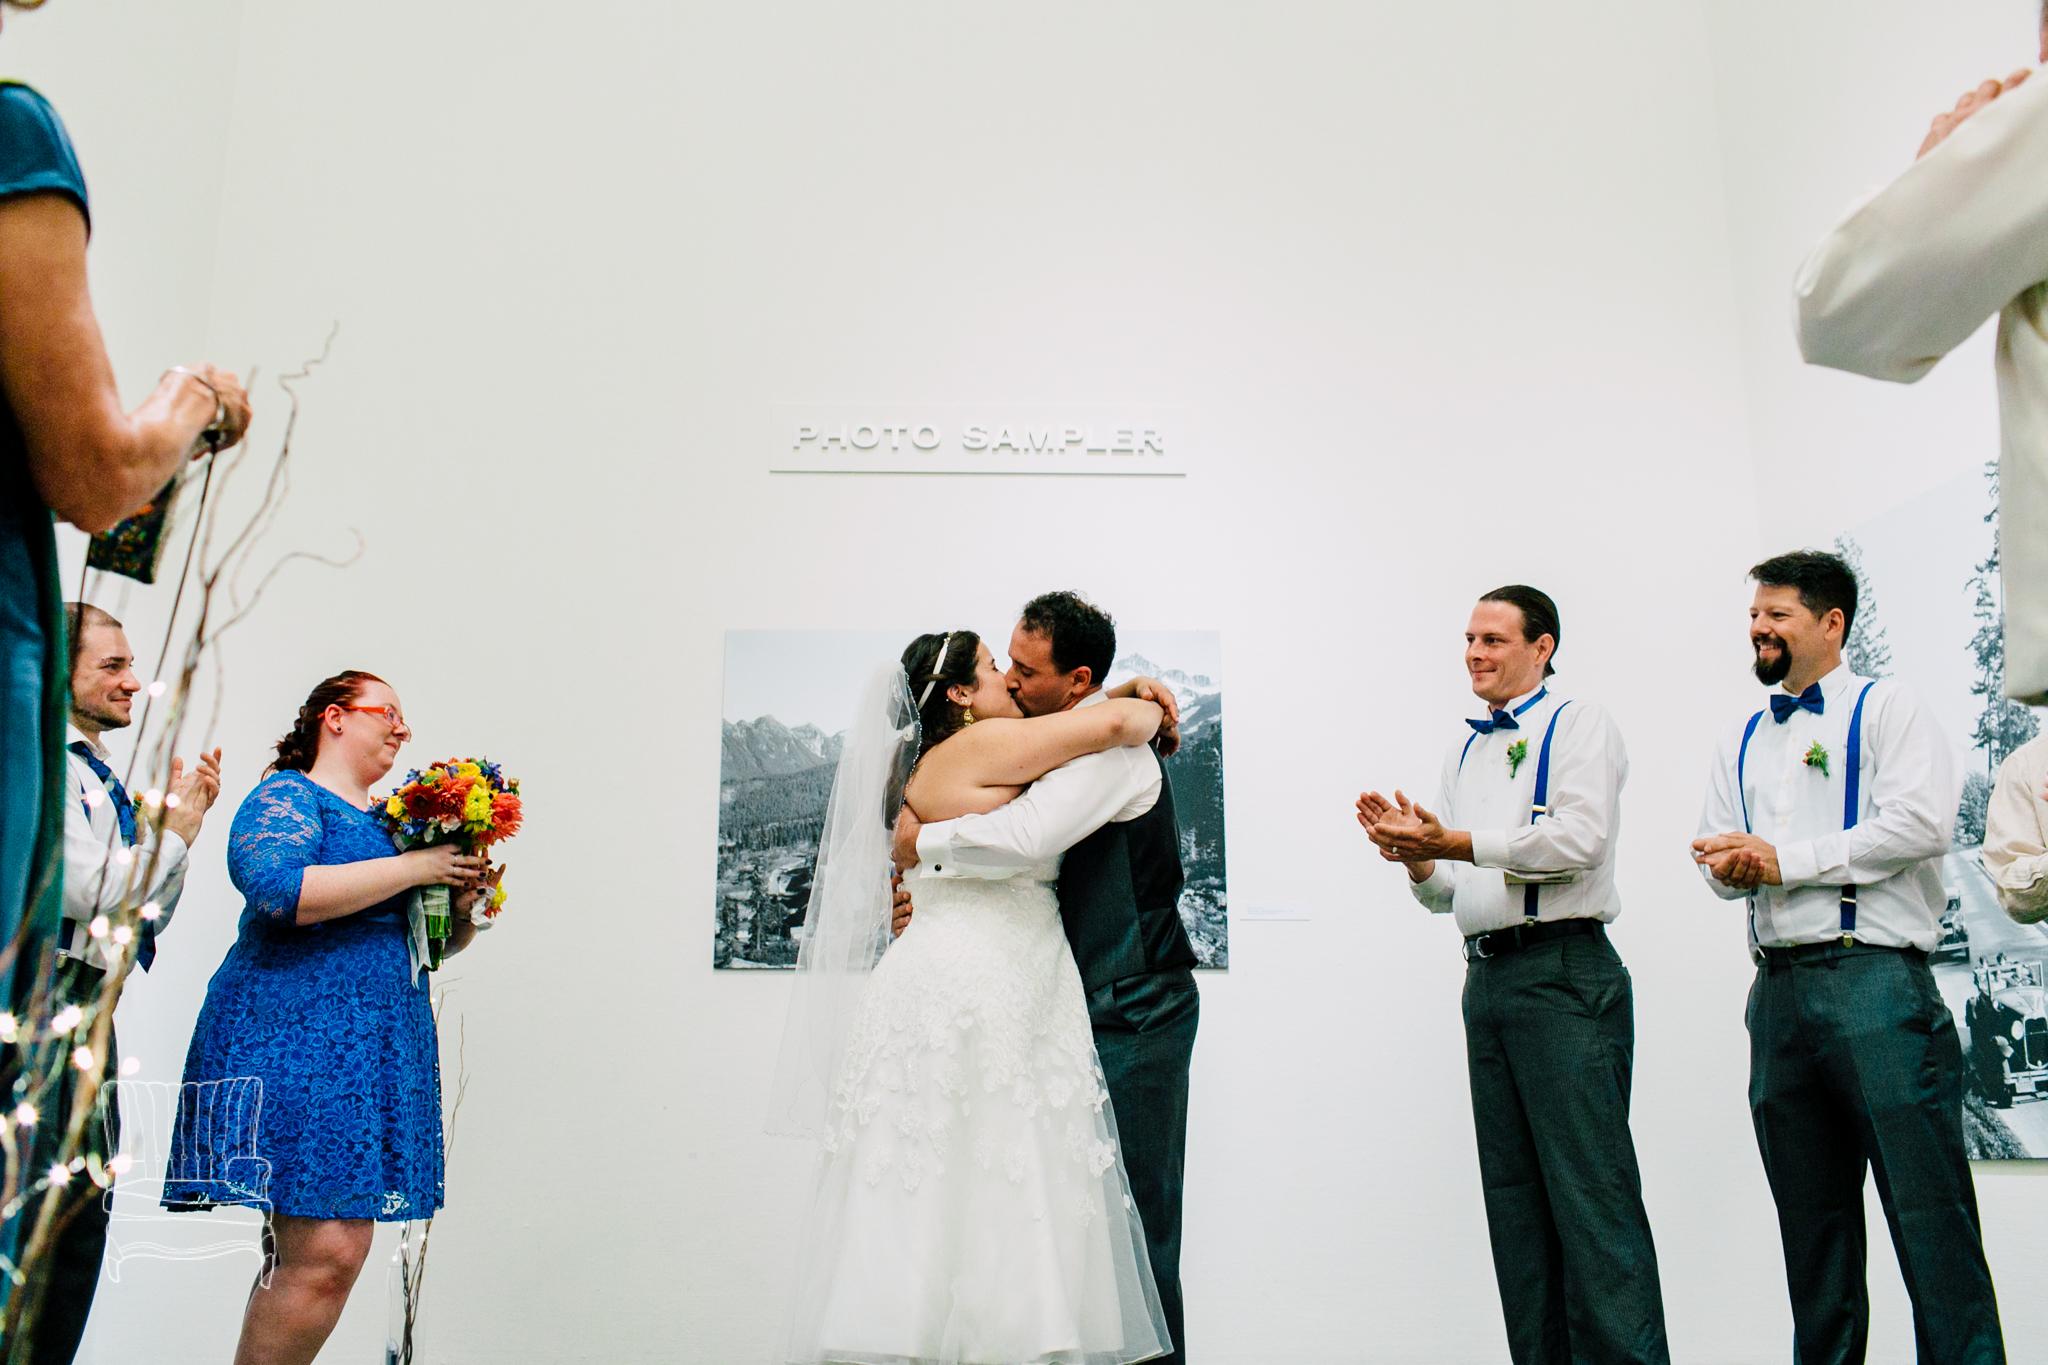 bellingham-whatcom-museum-wedding-katheryn-moran-photography-bribran-26.jpg